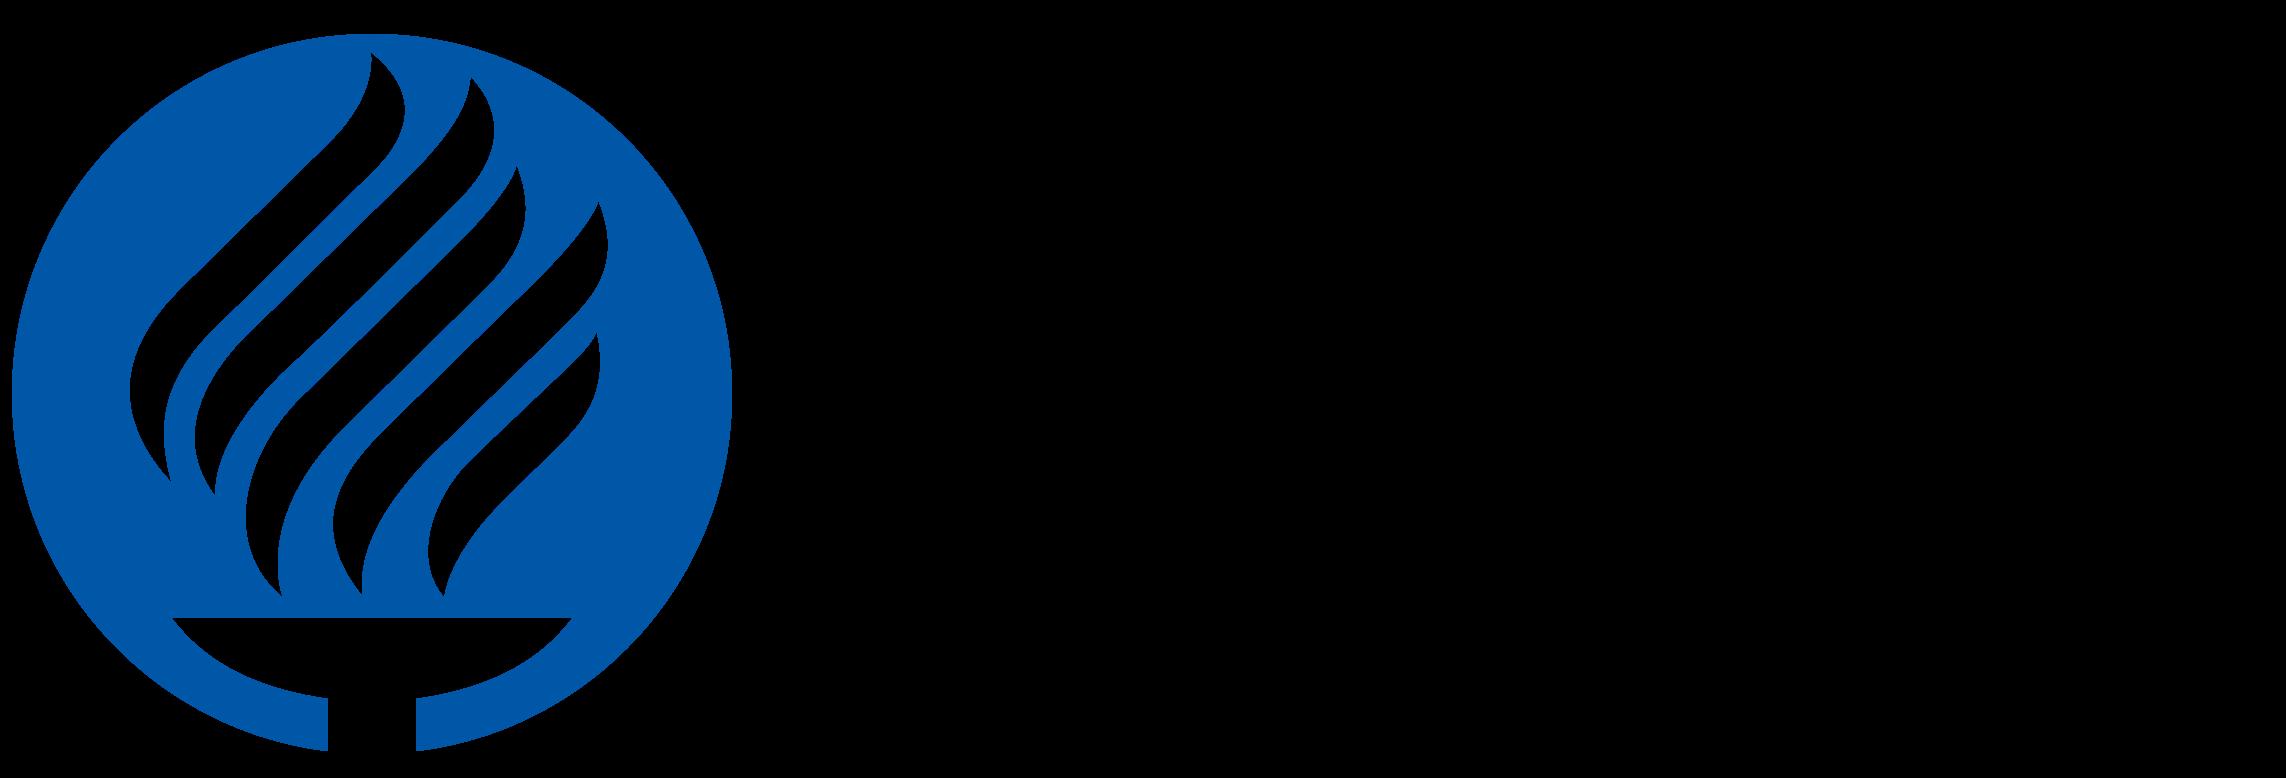 Tecsalud Logo